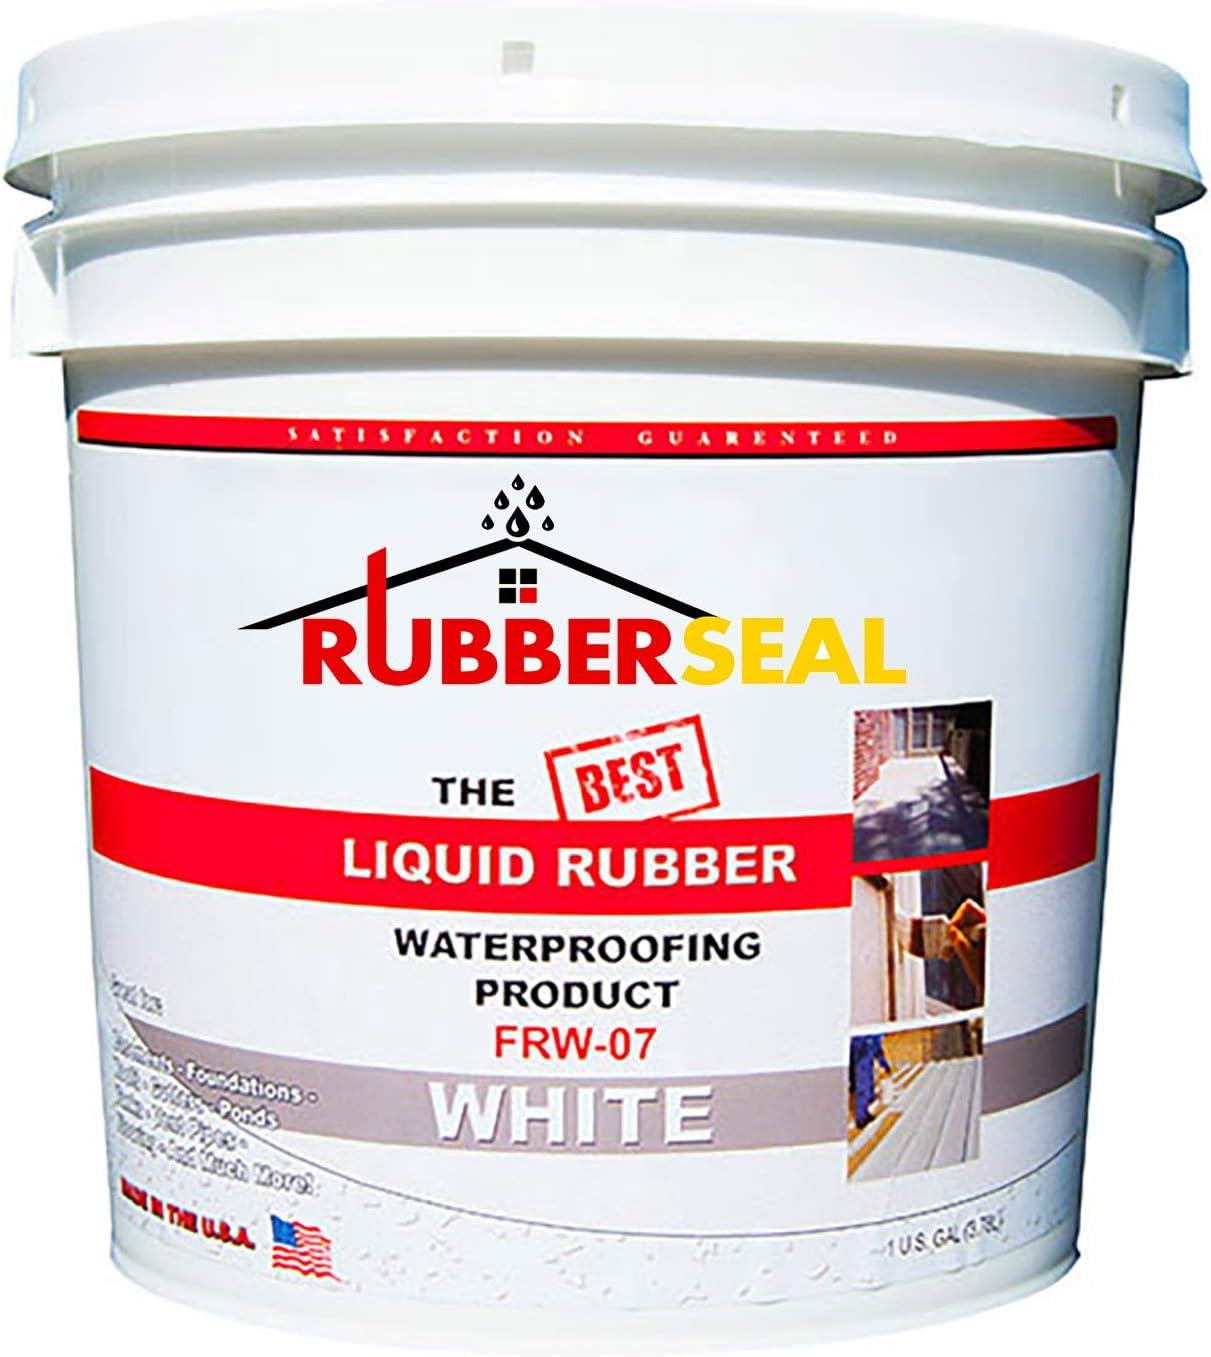 Rubberseal Liquid Rubber Paint